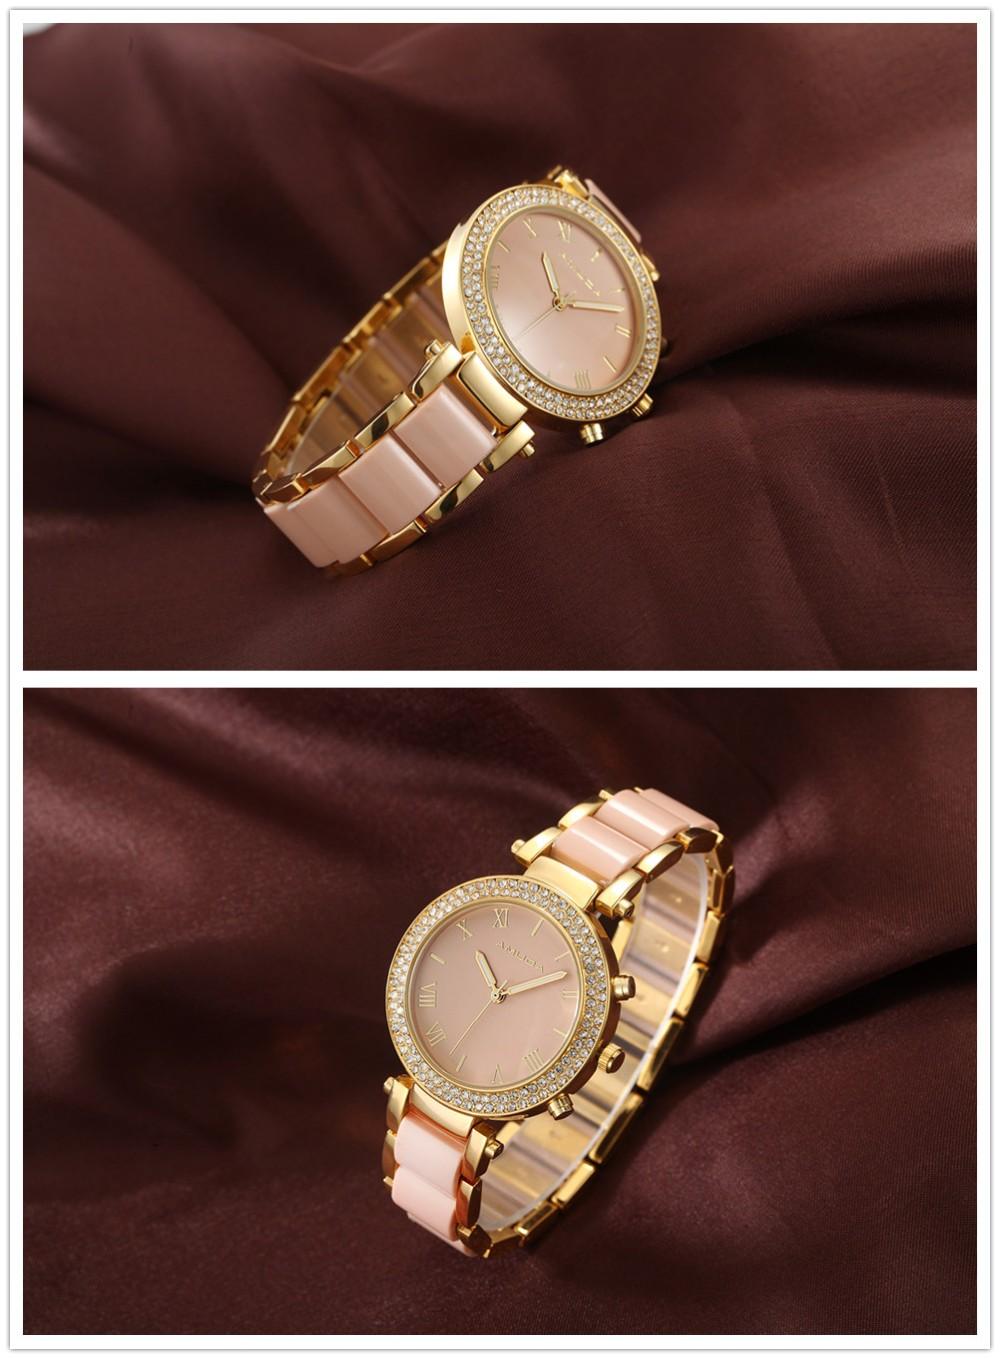 c5dc711010d4b Fashion Women Casual Watches Ladies Wrist Watch Gold Bracelet Simulated  Ceramic Dress Diamond Quartz-watch relogio feminino